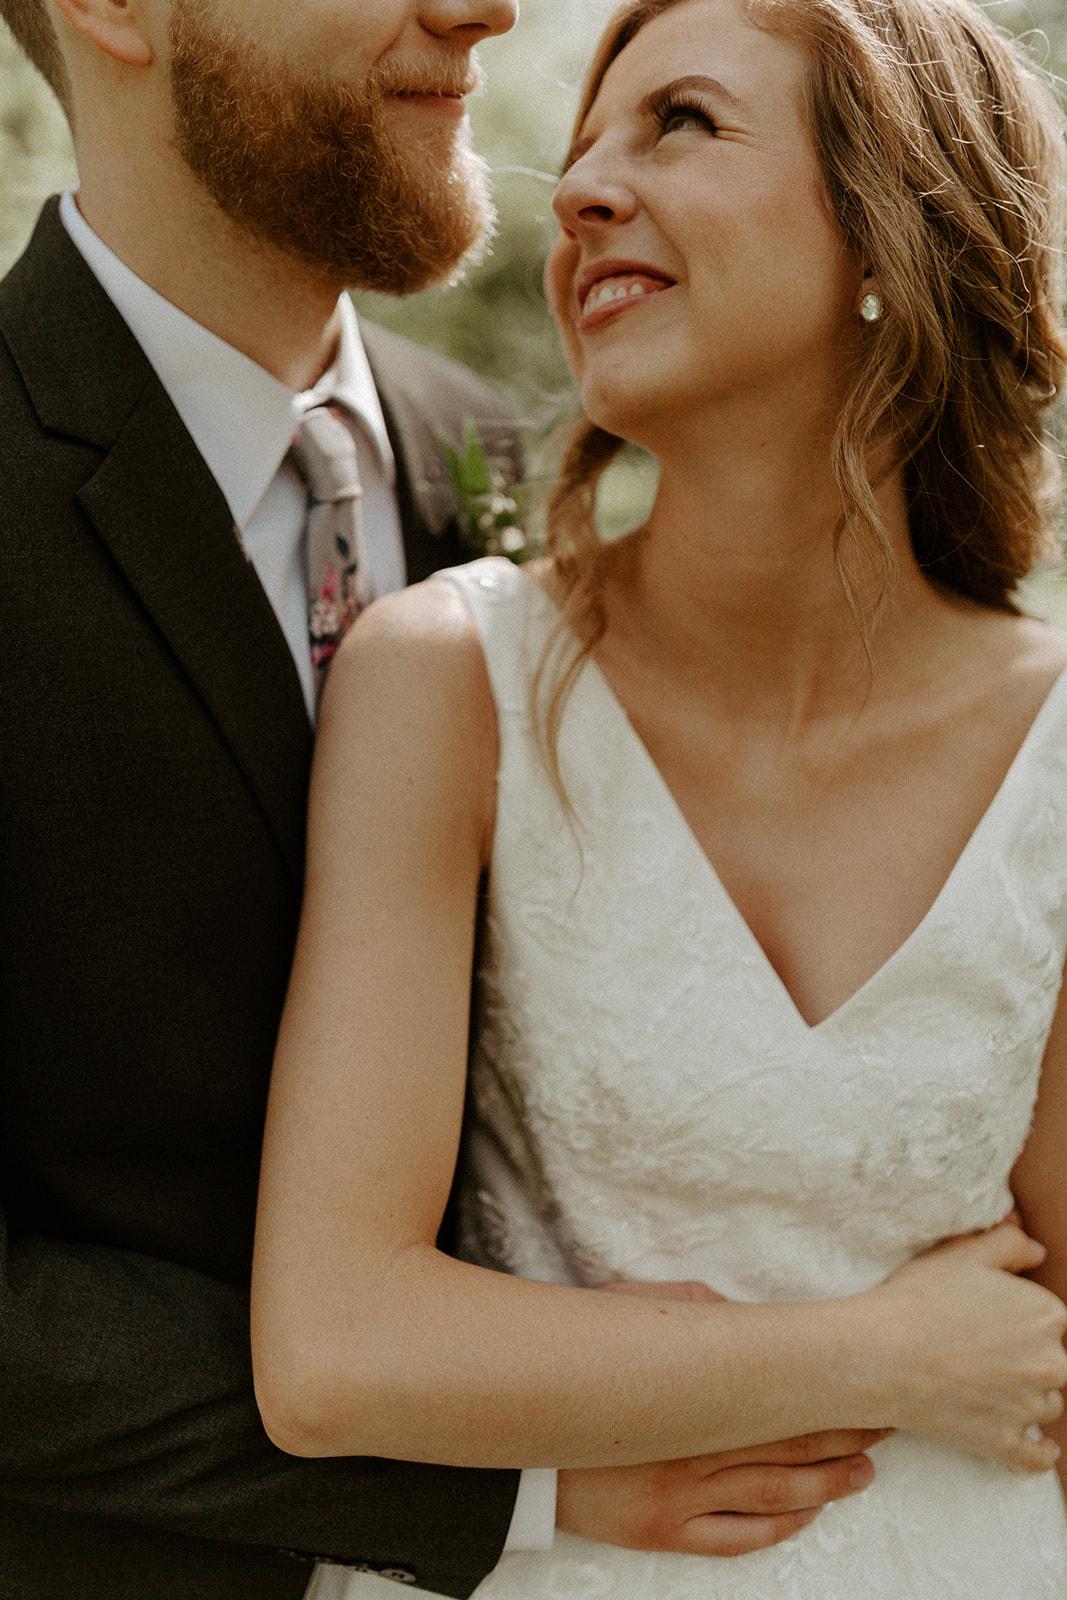 camp_wokanda_peoria_illinois_wedding_photographer_wright_photographs_bliese_0616.jpg